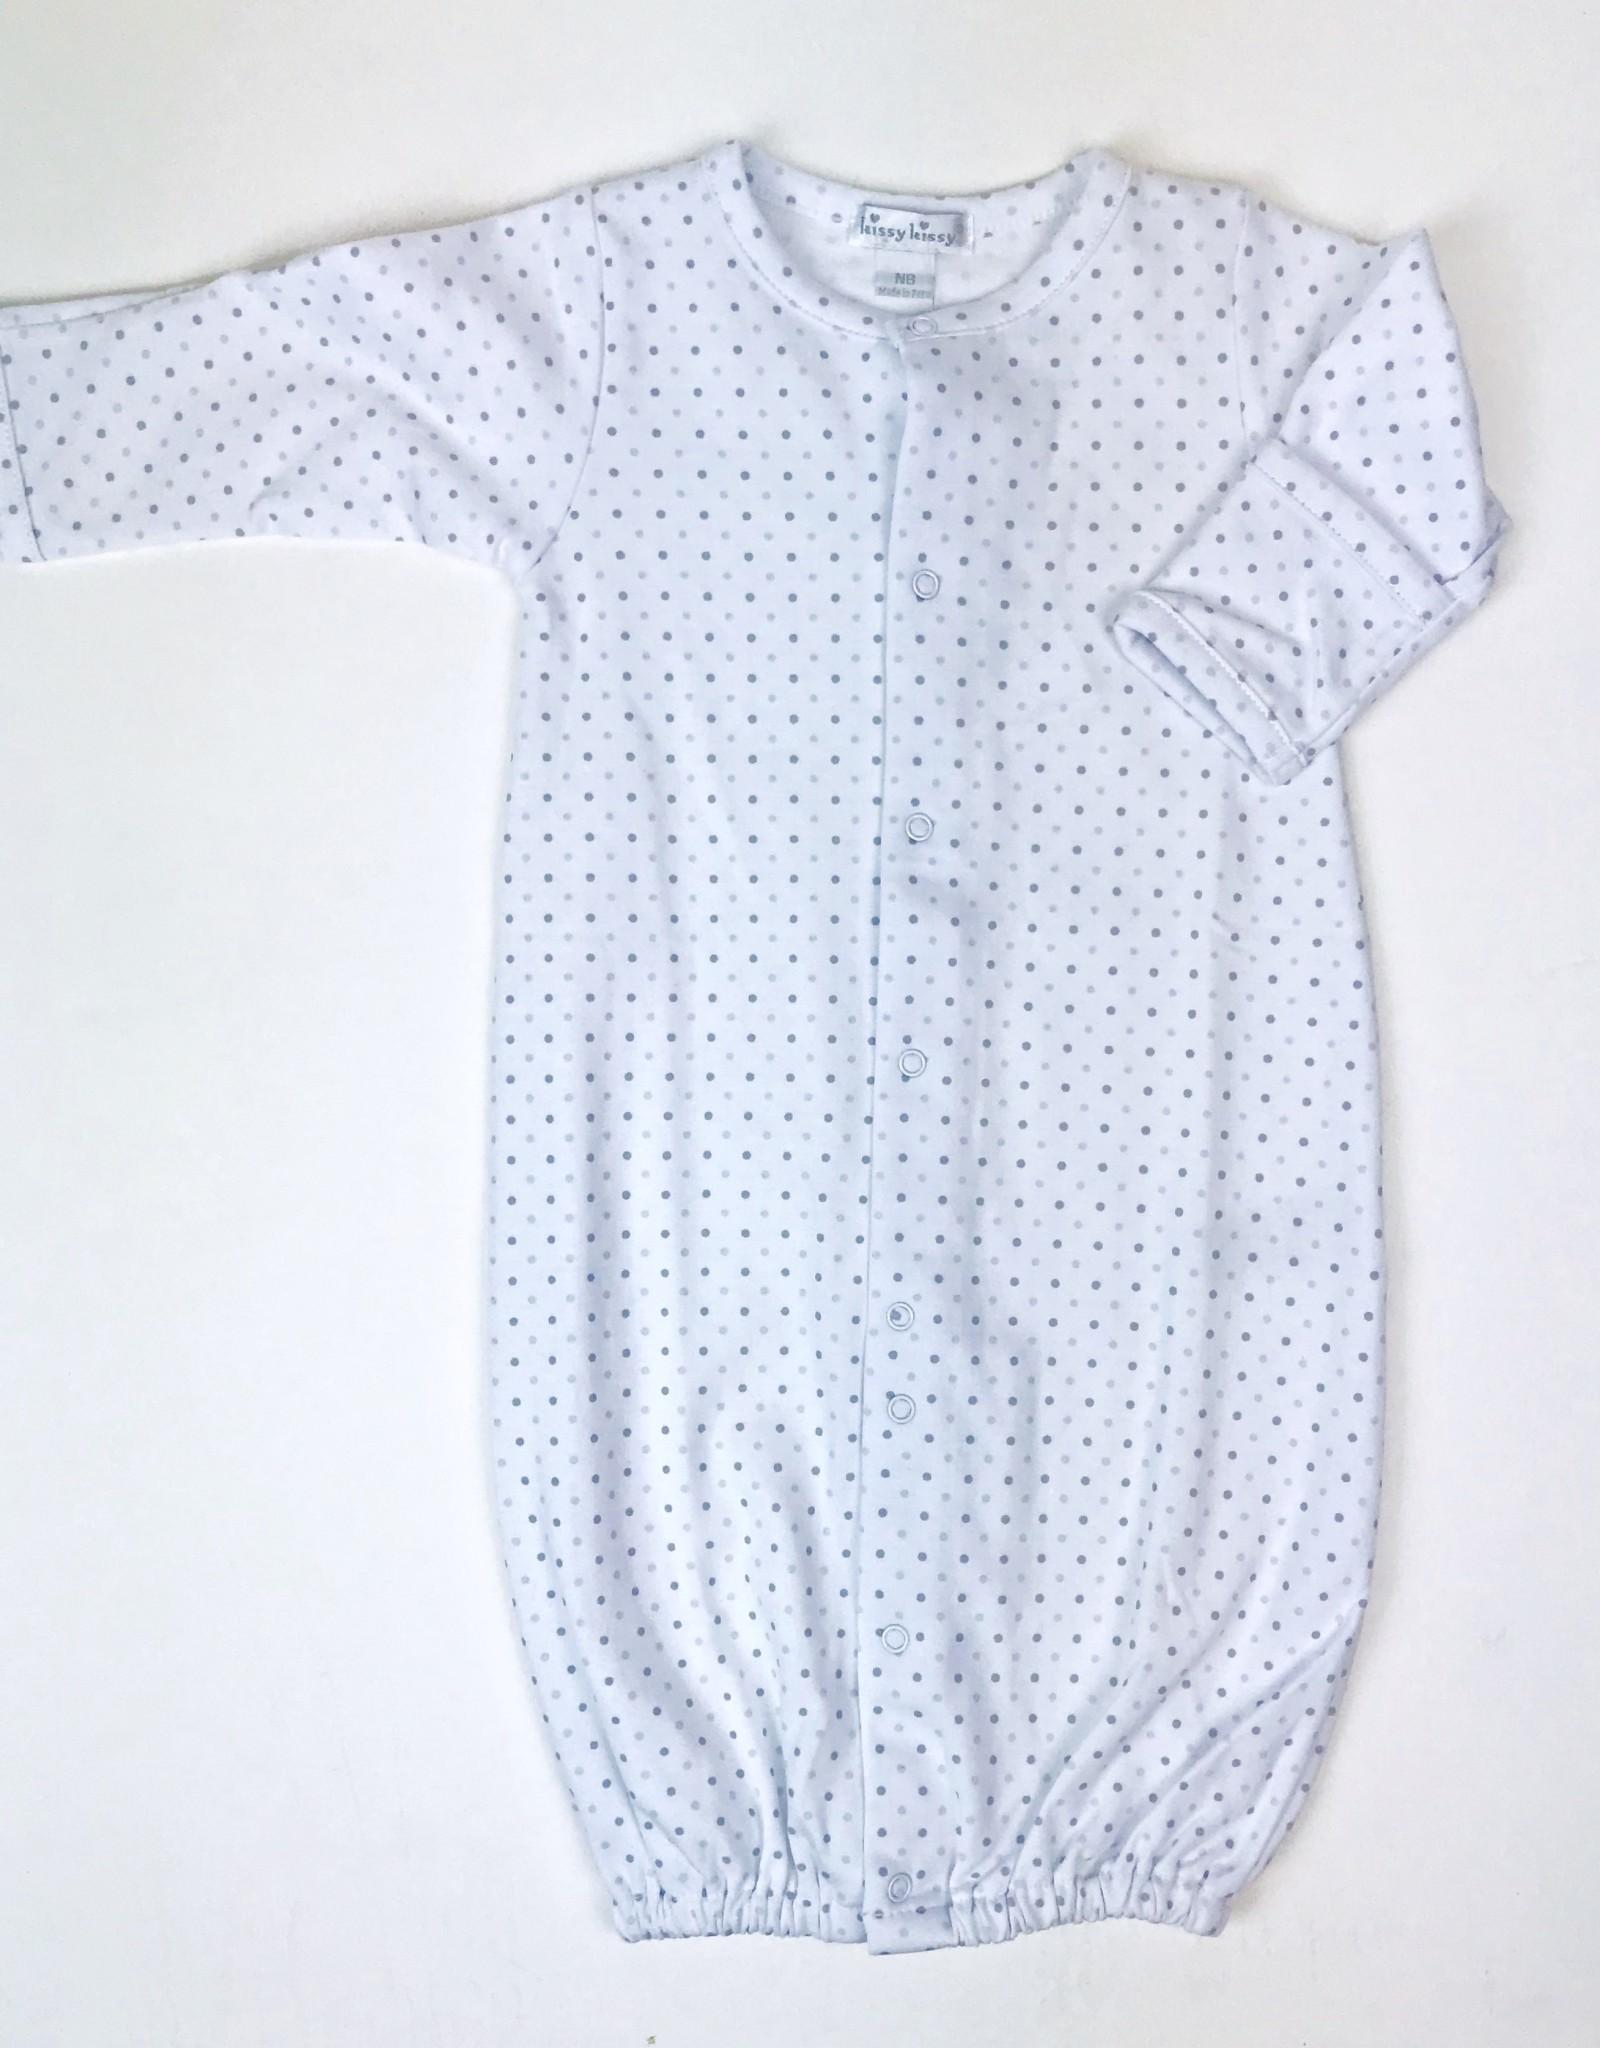 KissyKissy Gown White Dot blue or Grey NB-6m